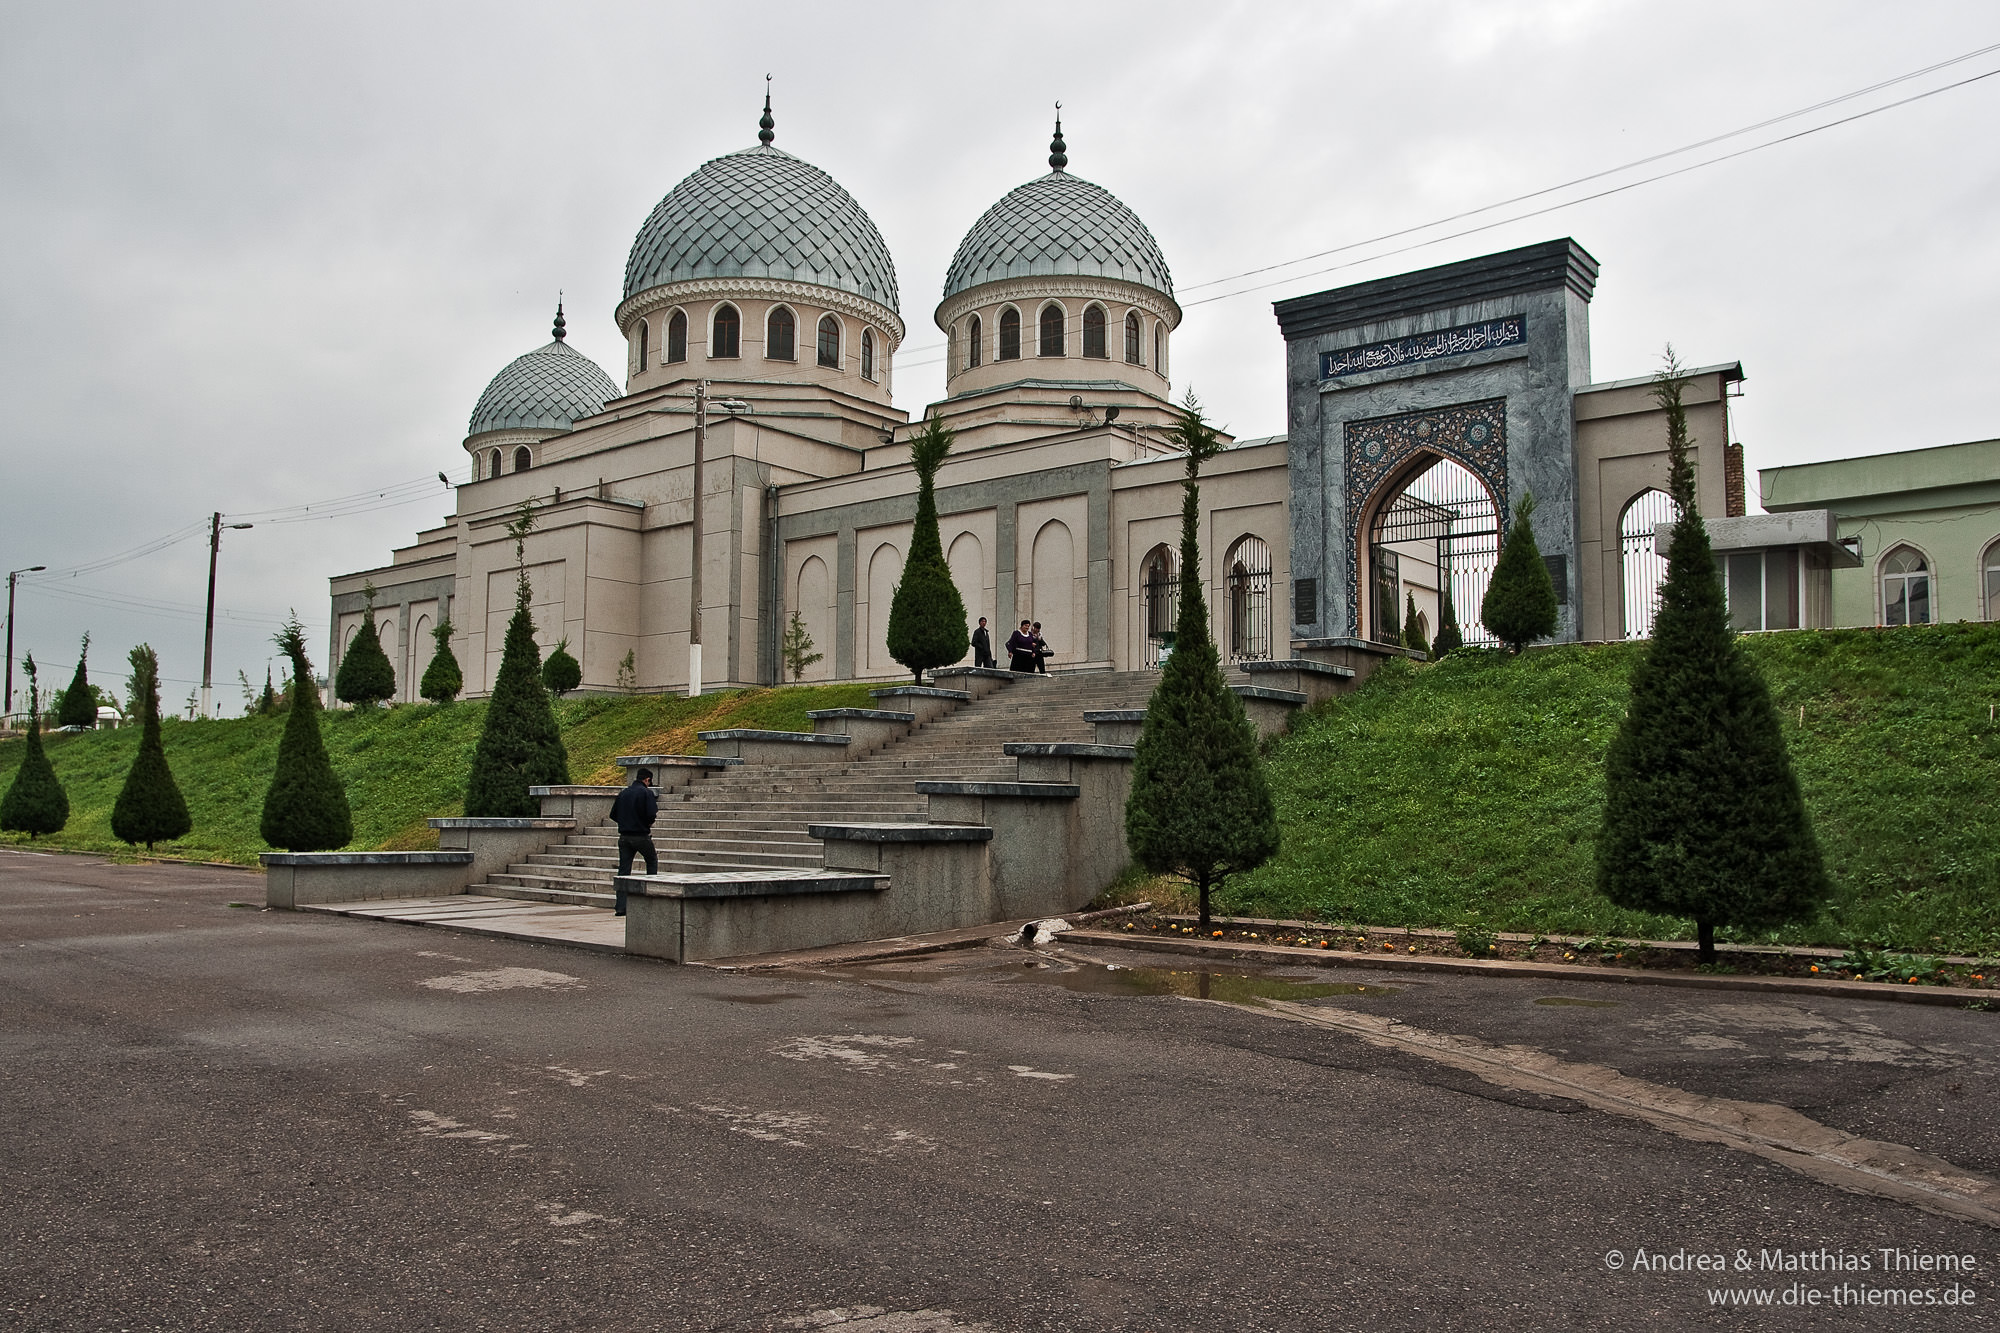 Moschee Dschami, Juma Moschee (khoja ahrar, Tashkent)